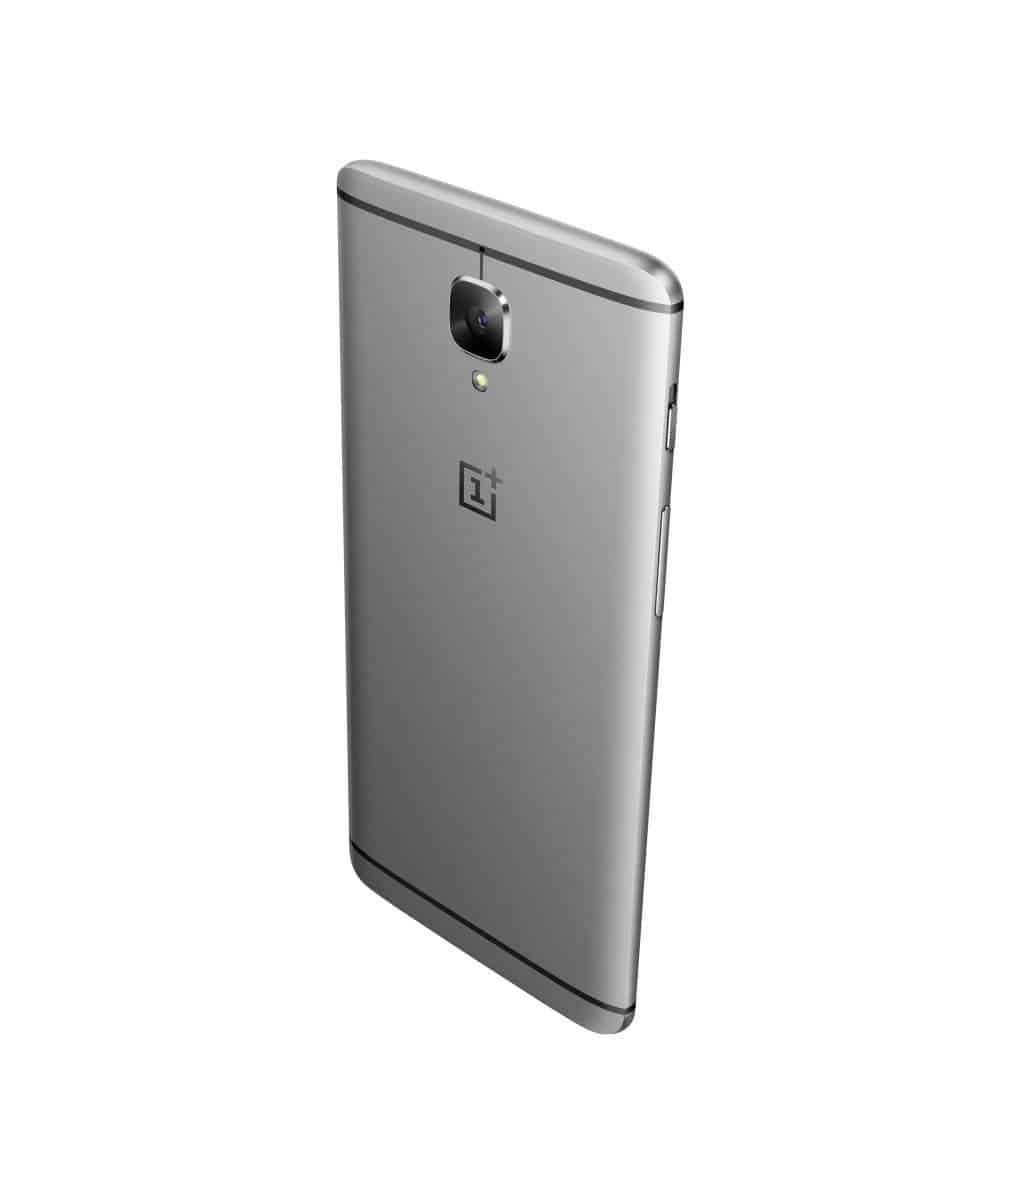 OnePlus 3 Graphite Press AH 9